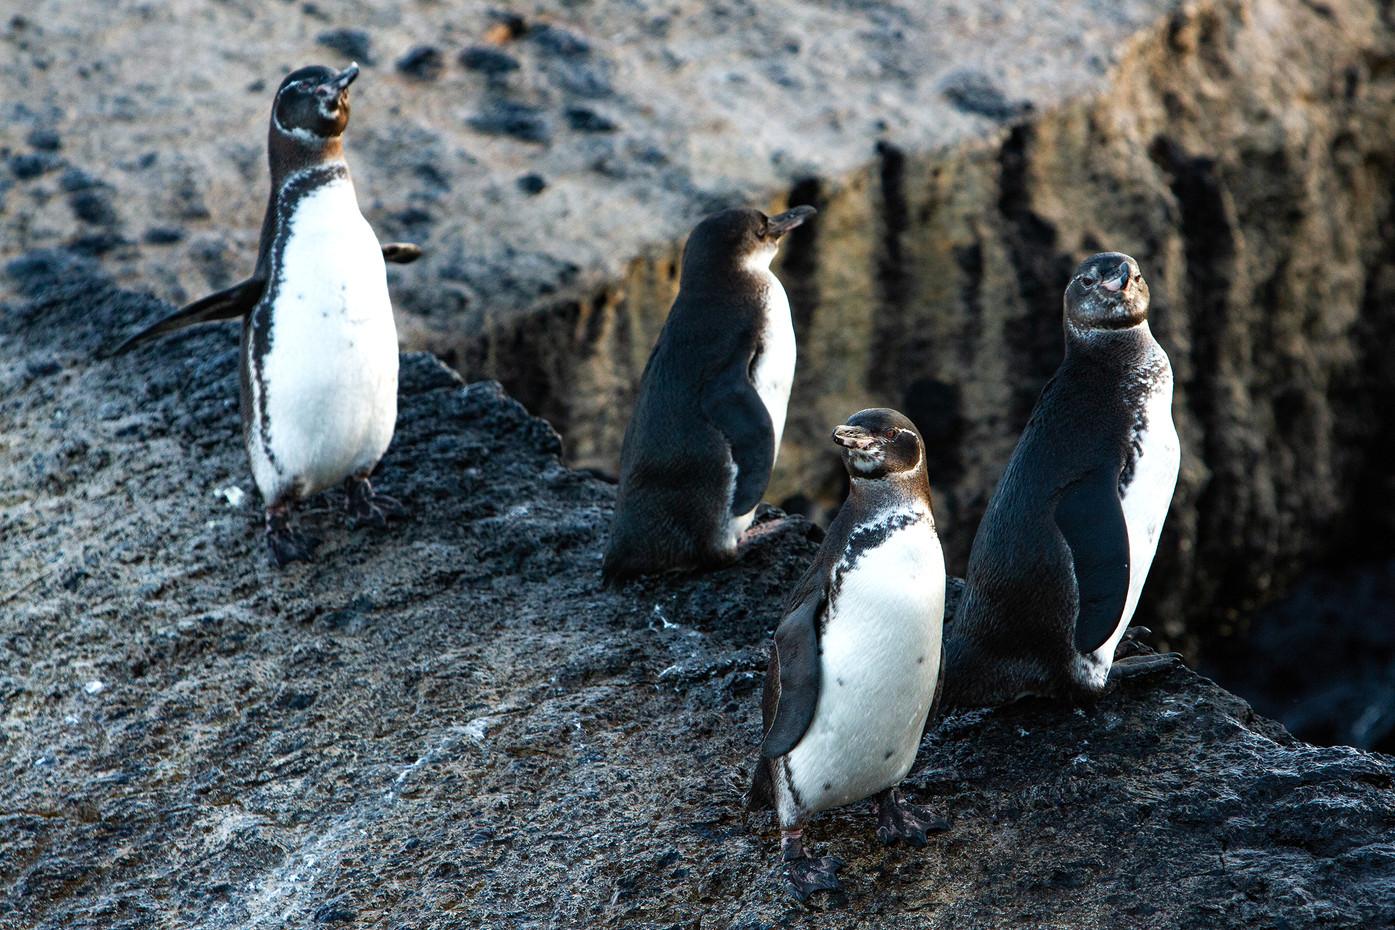 Galapagos Penguins in the Galapagos Islands, Equador